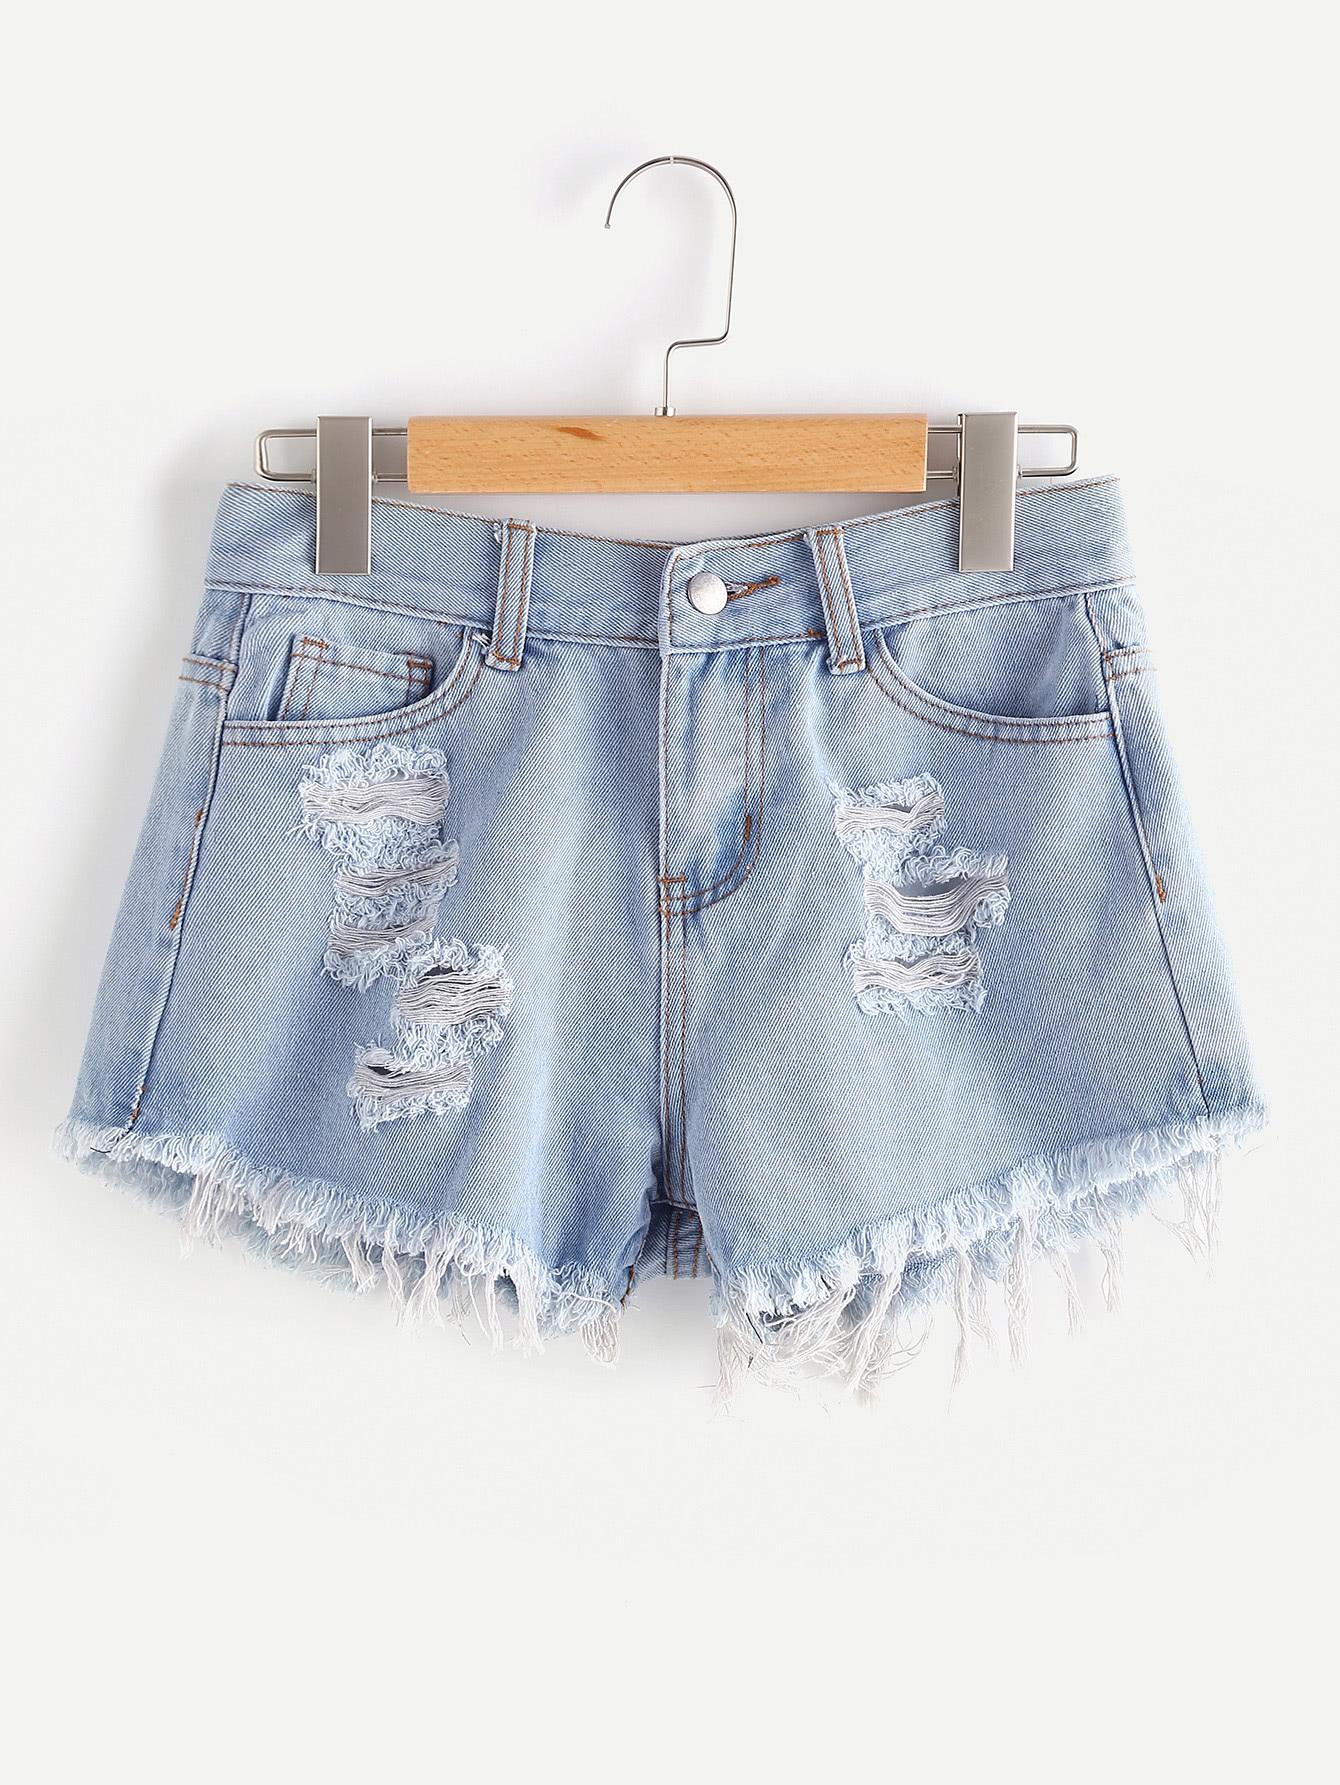 Faded Wash Distressed Denim Shorts shorts170712450